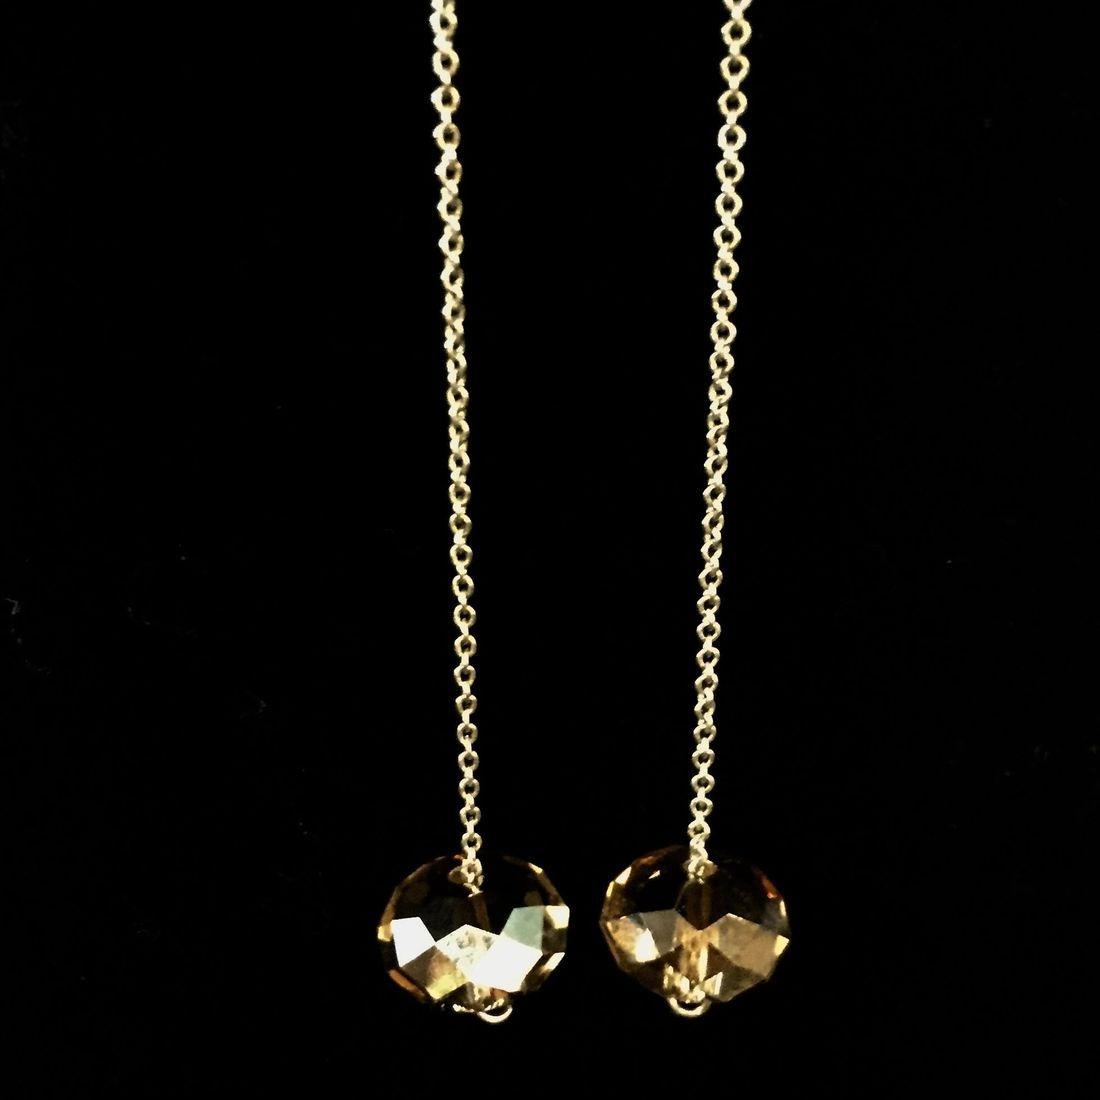 12mm Golden Swarovski drop earrings with Swarovski crystal and sterling shepherd hooks